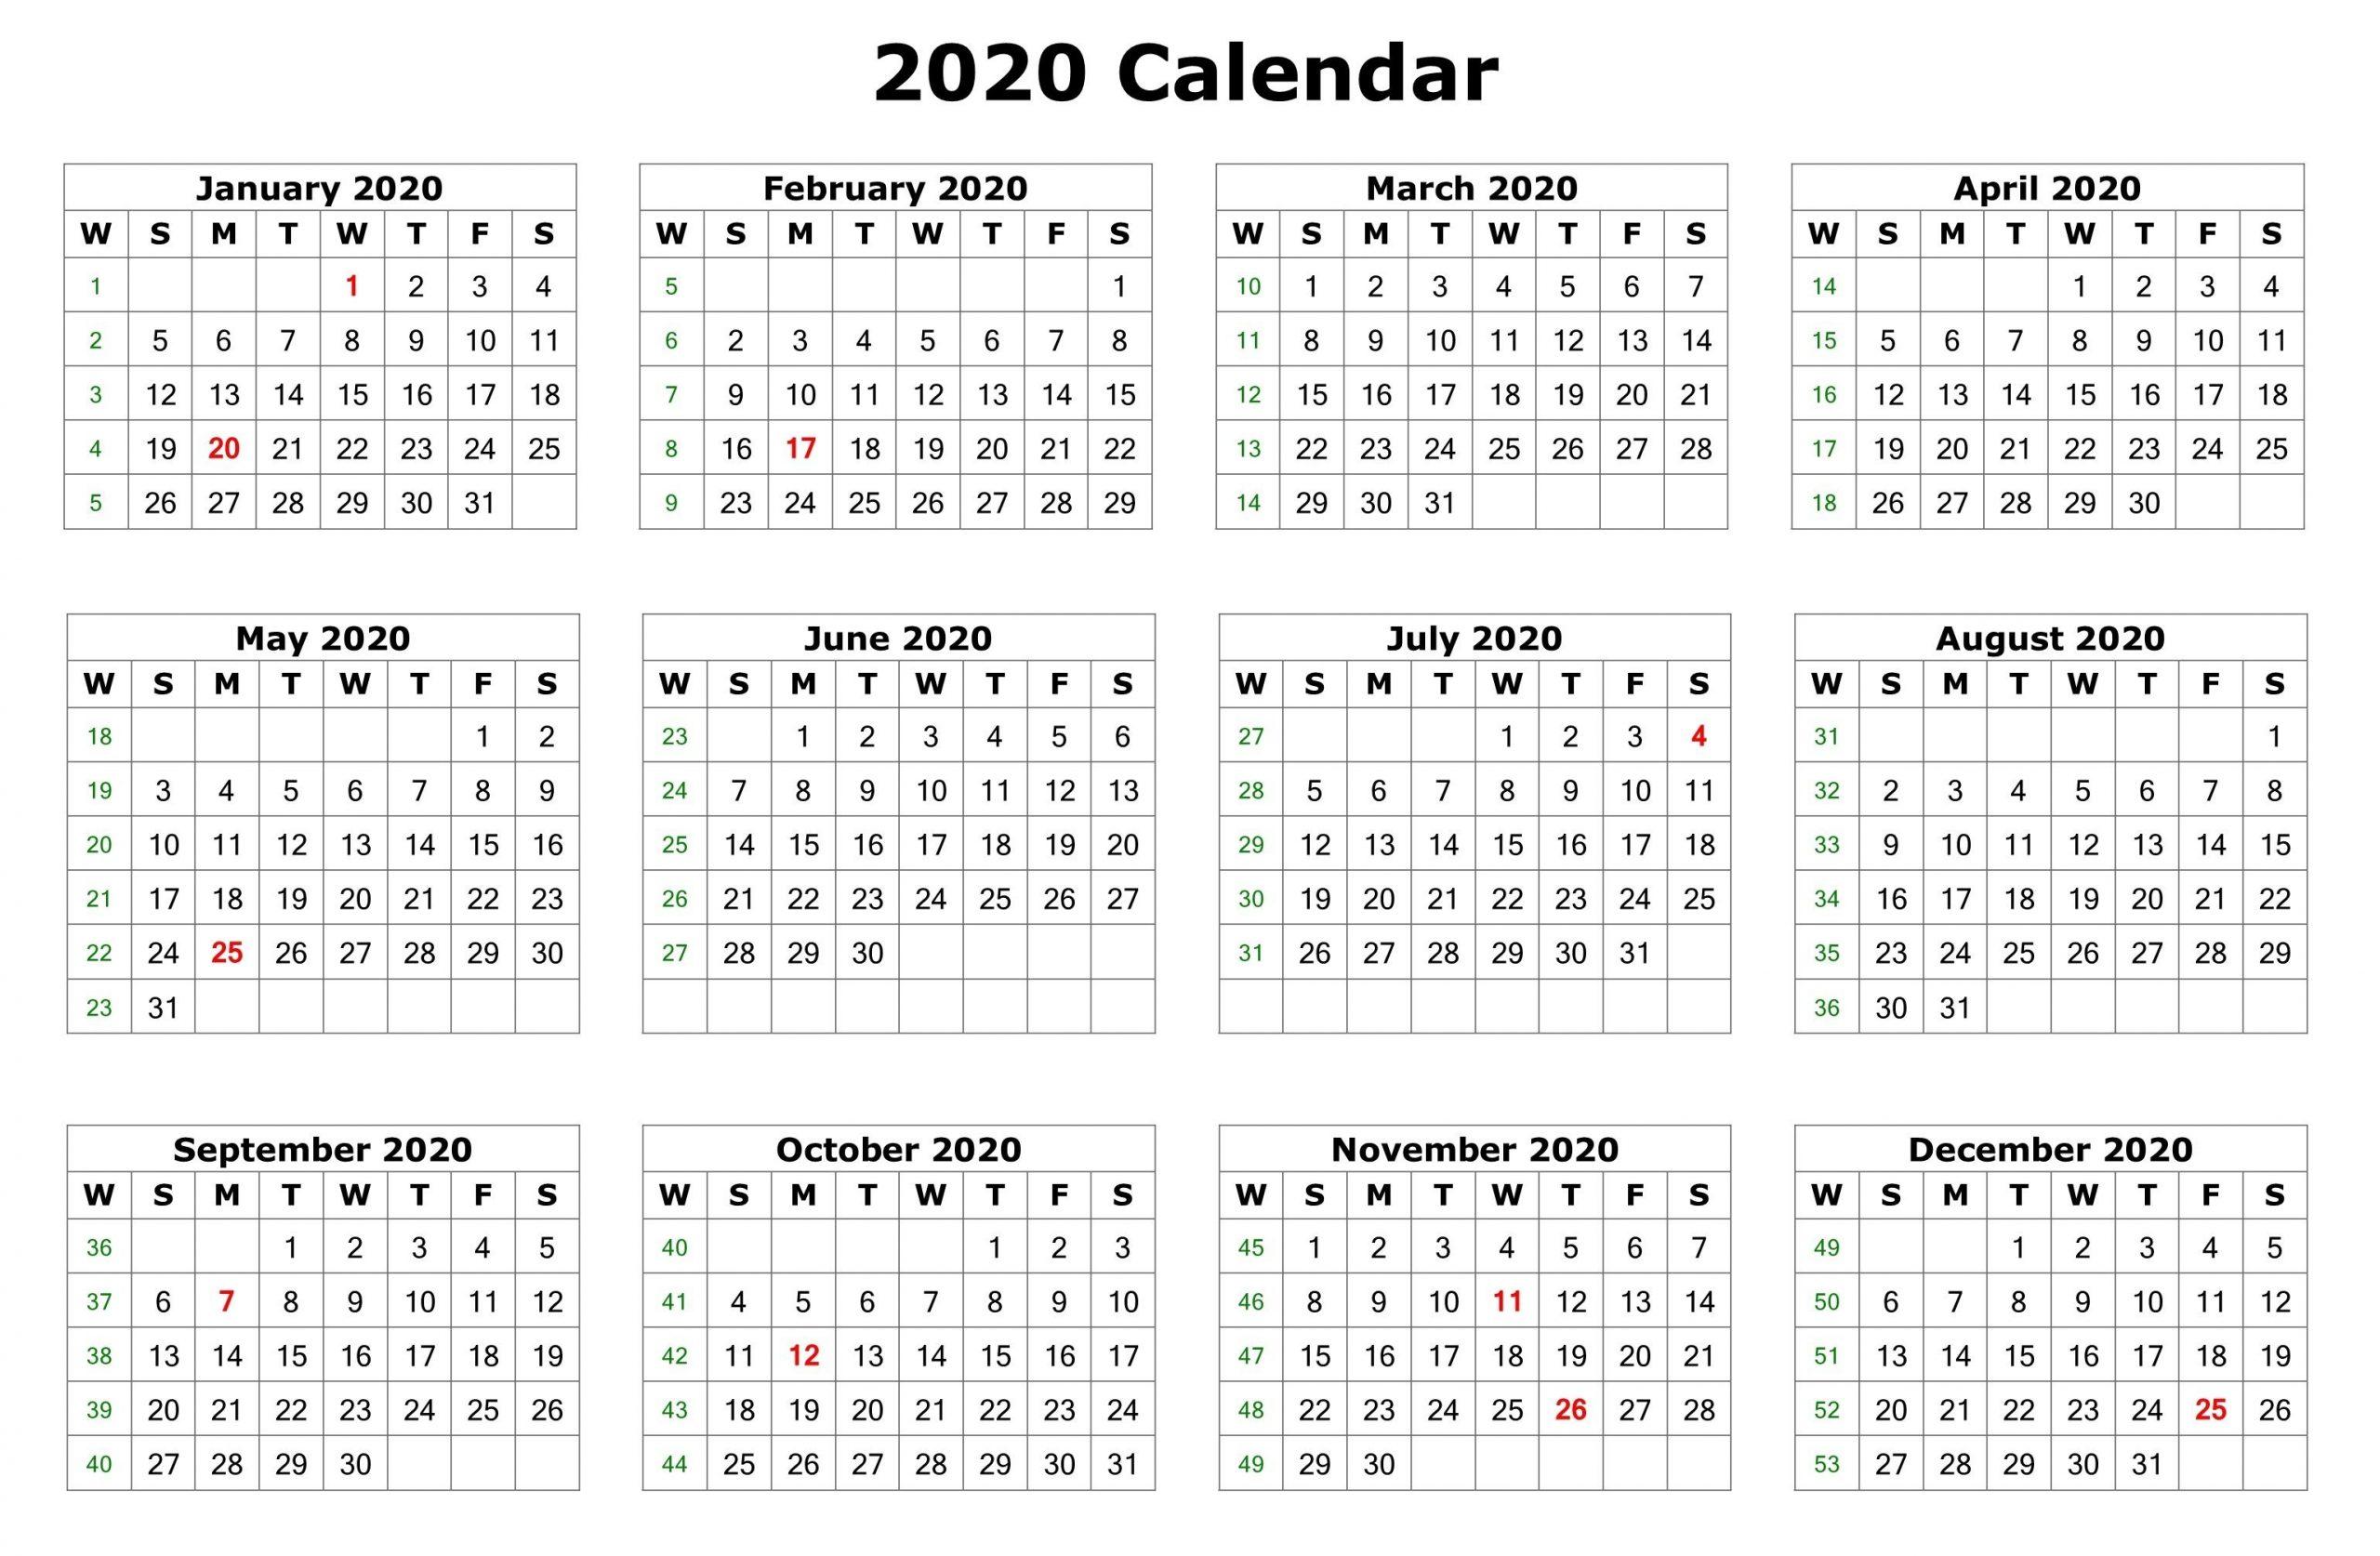 2020 One Page Calendar Printable   Calendar 2020 Editable 12 Month Calendar